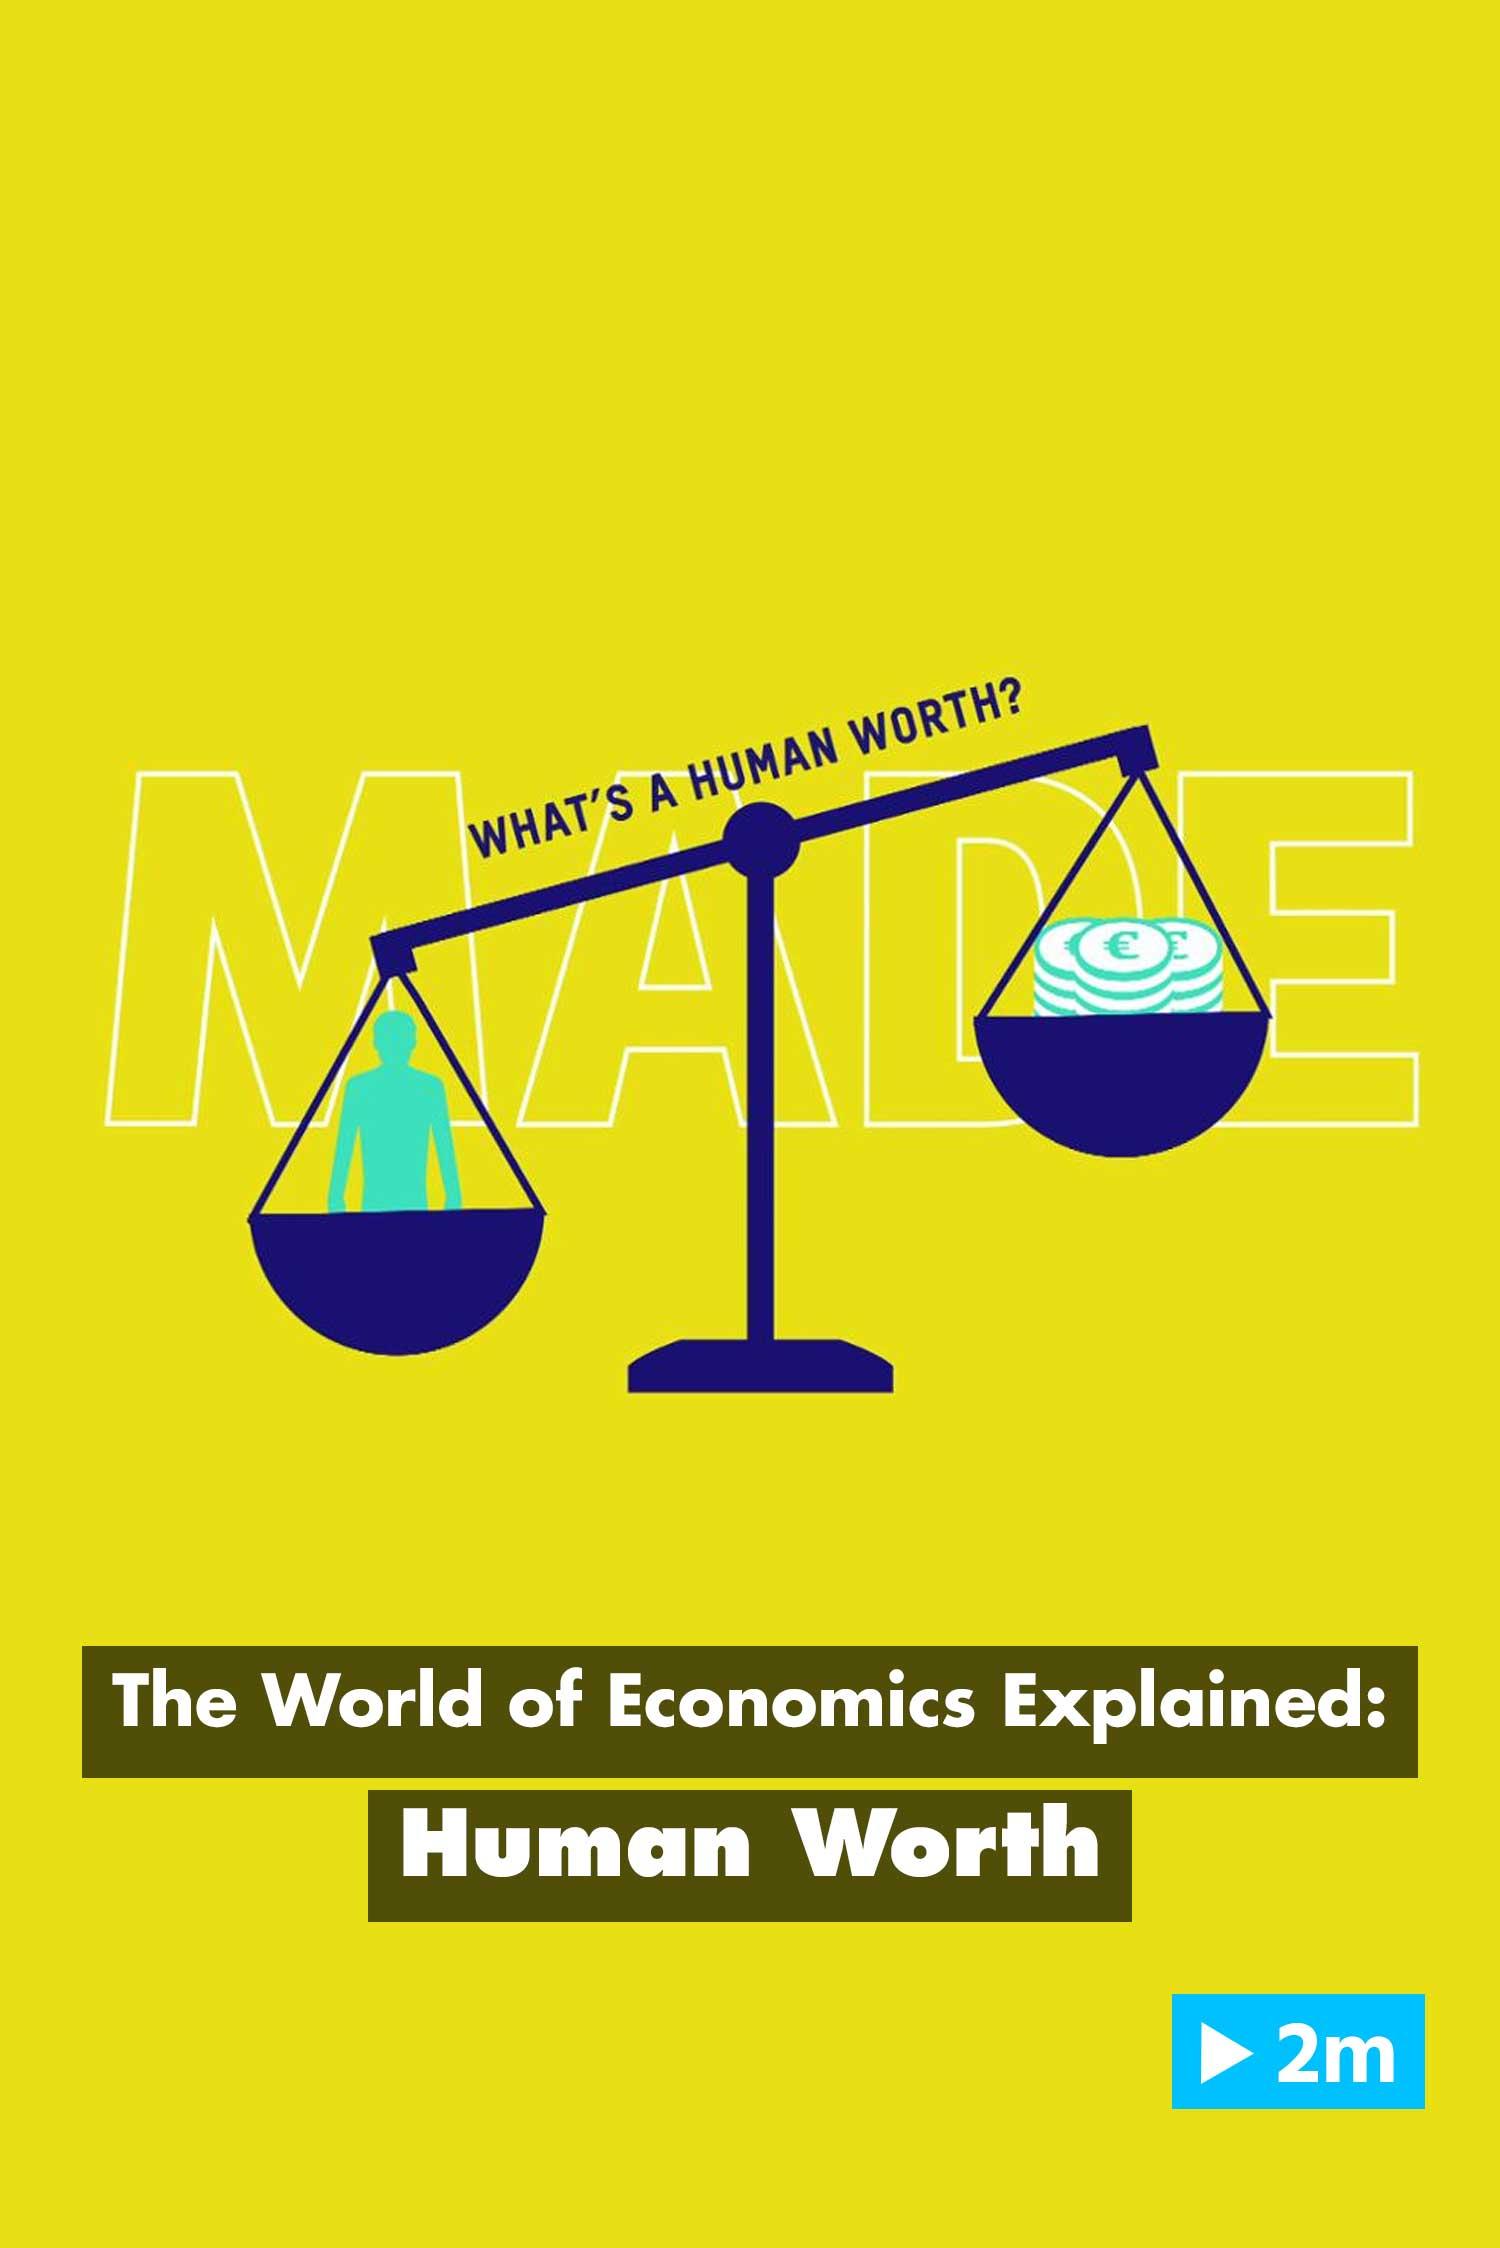 The World of Economics Explained: Human worth